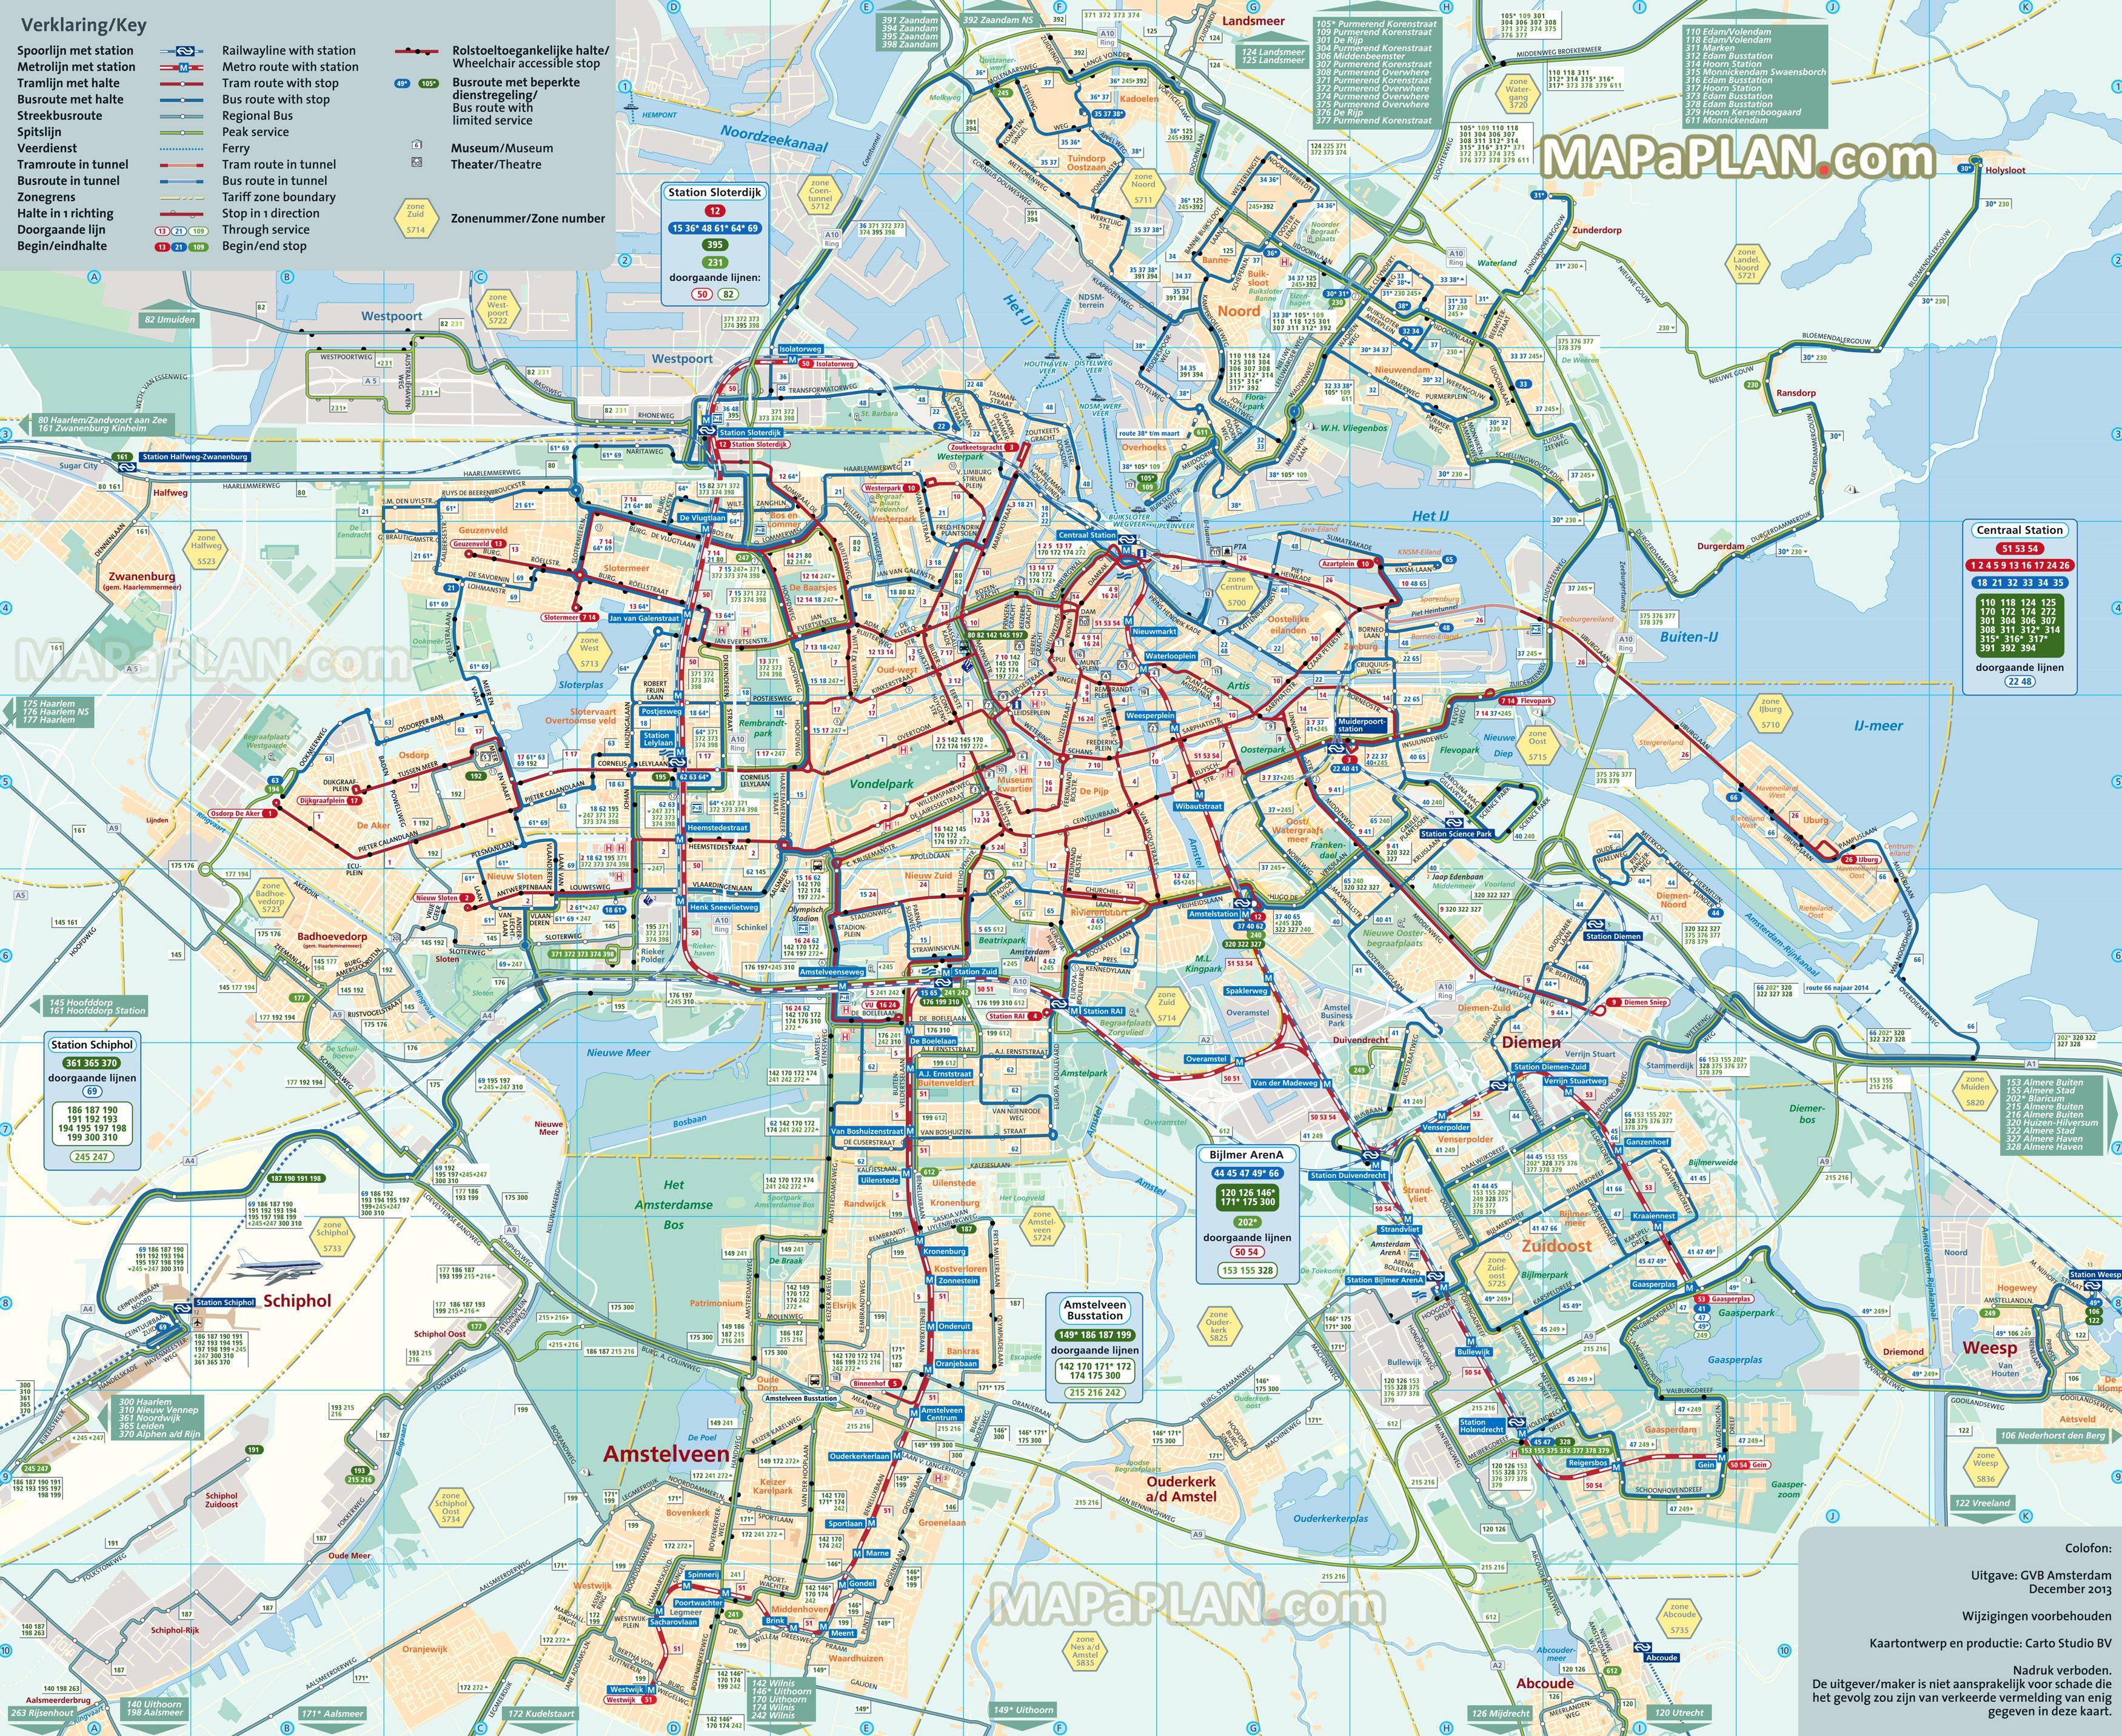 http://www.mapaplan/travel-map/amsterdam-netherlands-top ...